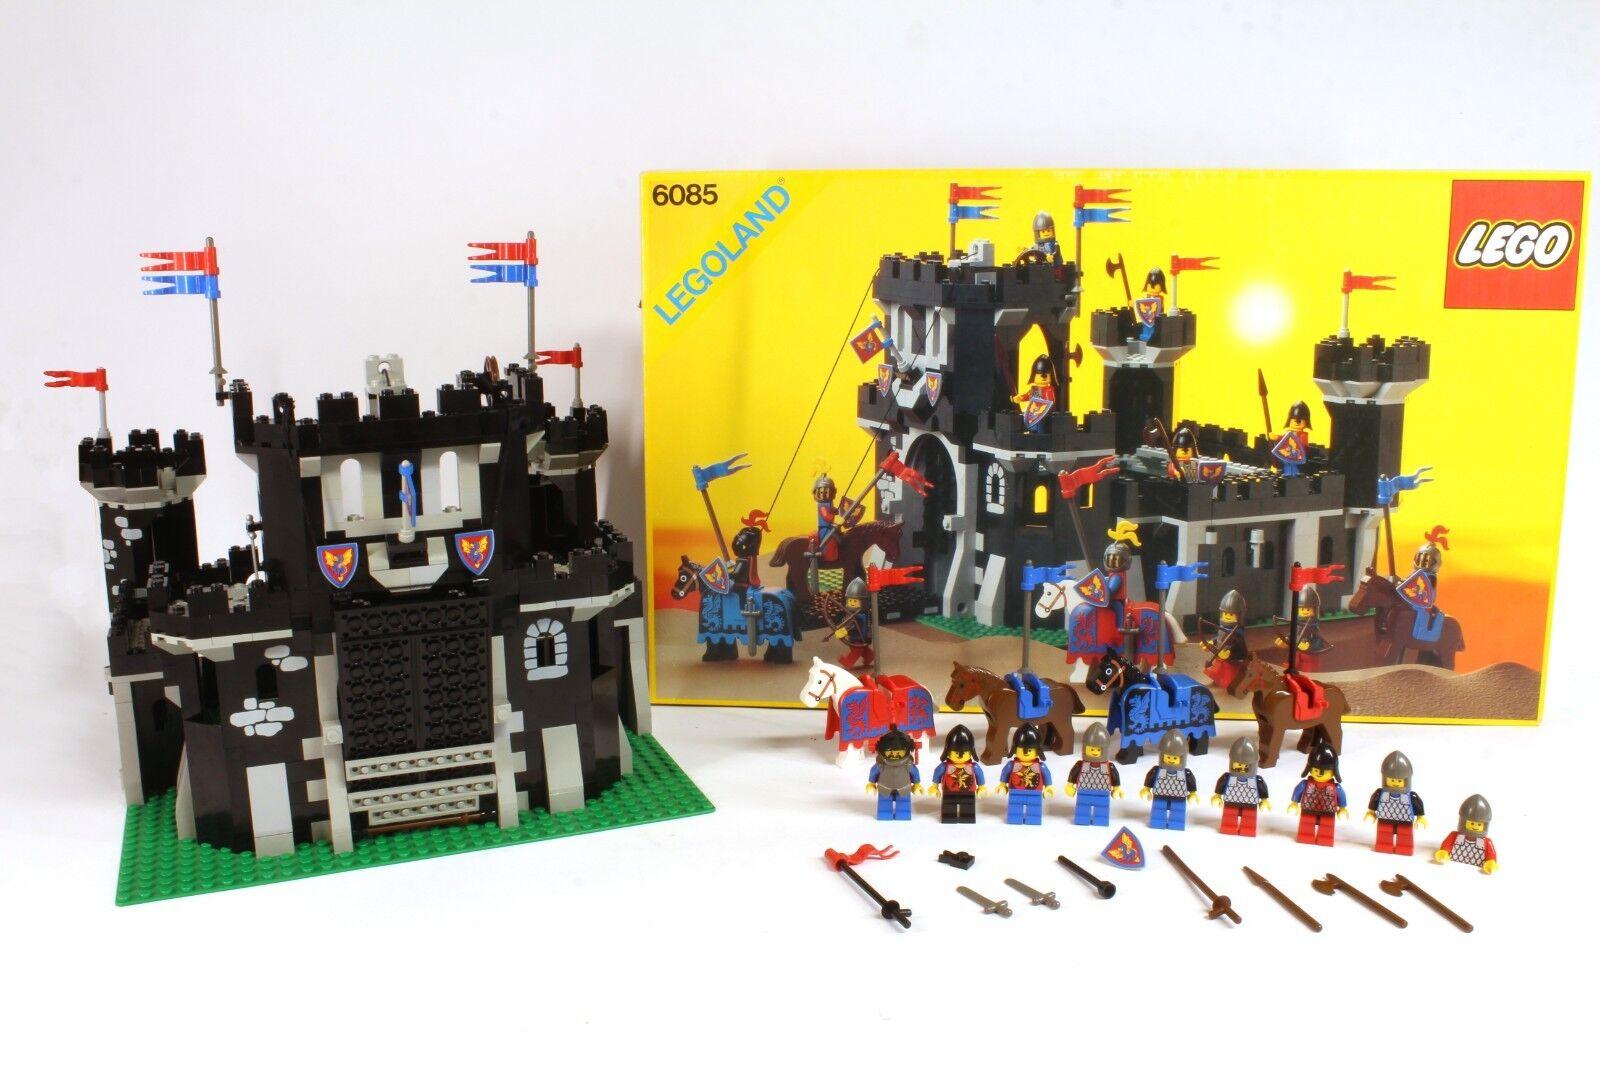 Lego 6085 Black Black Black monarque Castle Ritterburg Chevalier Incl. Neuf dans sa boîte & Instructions | Promotions  178b95